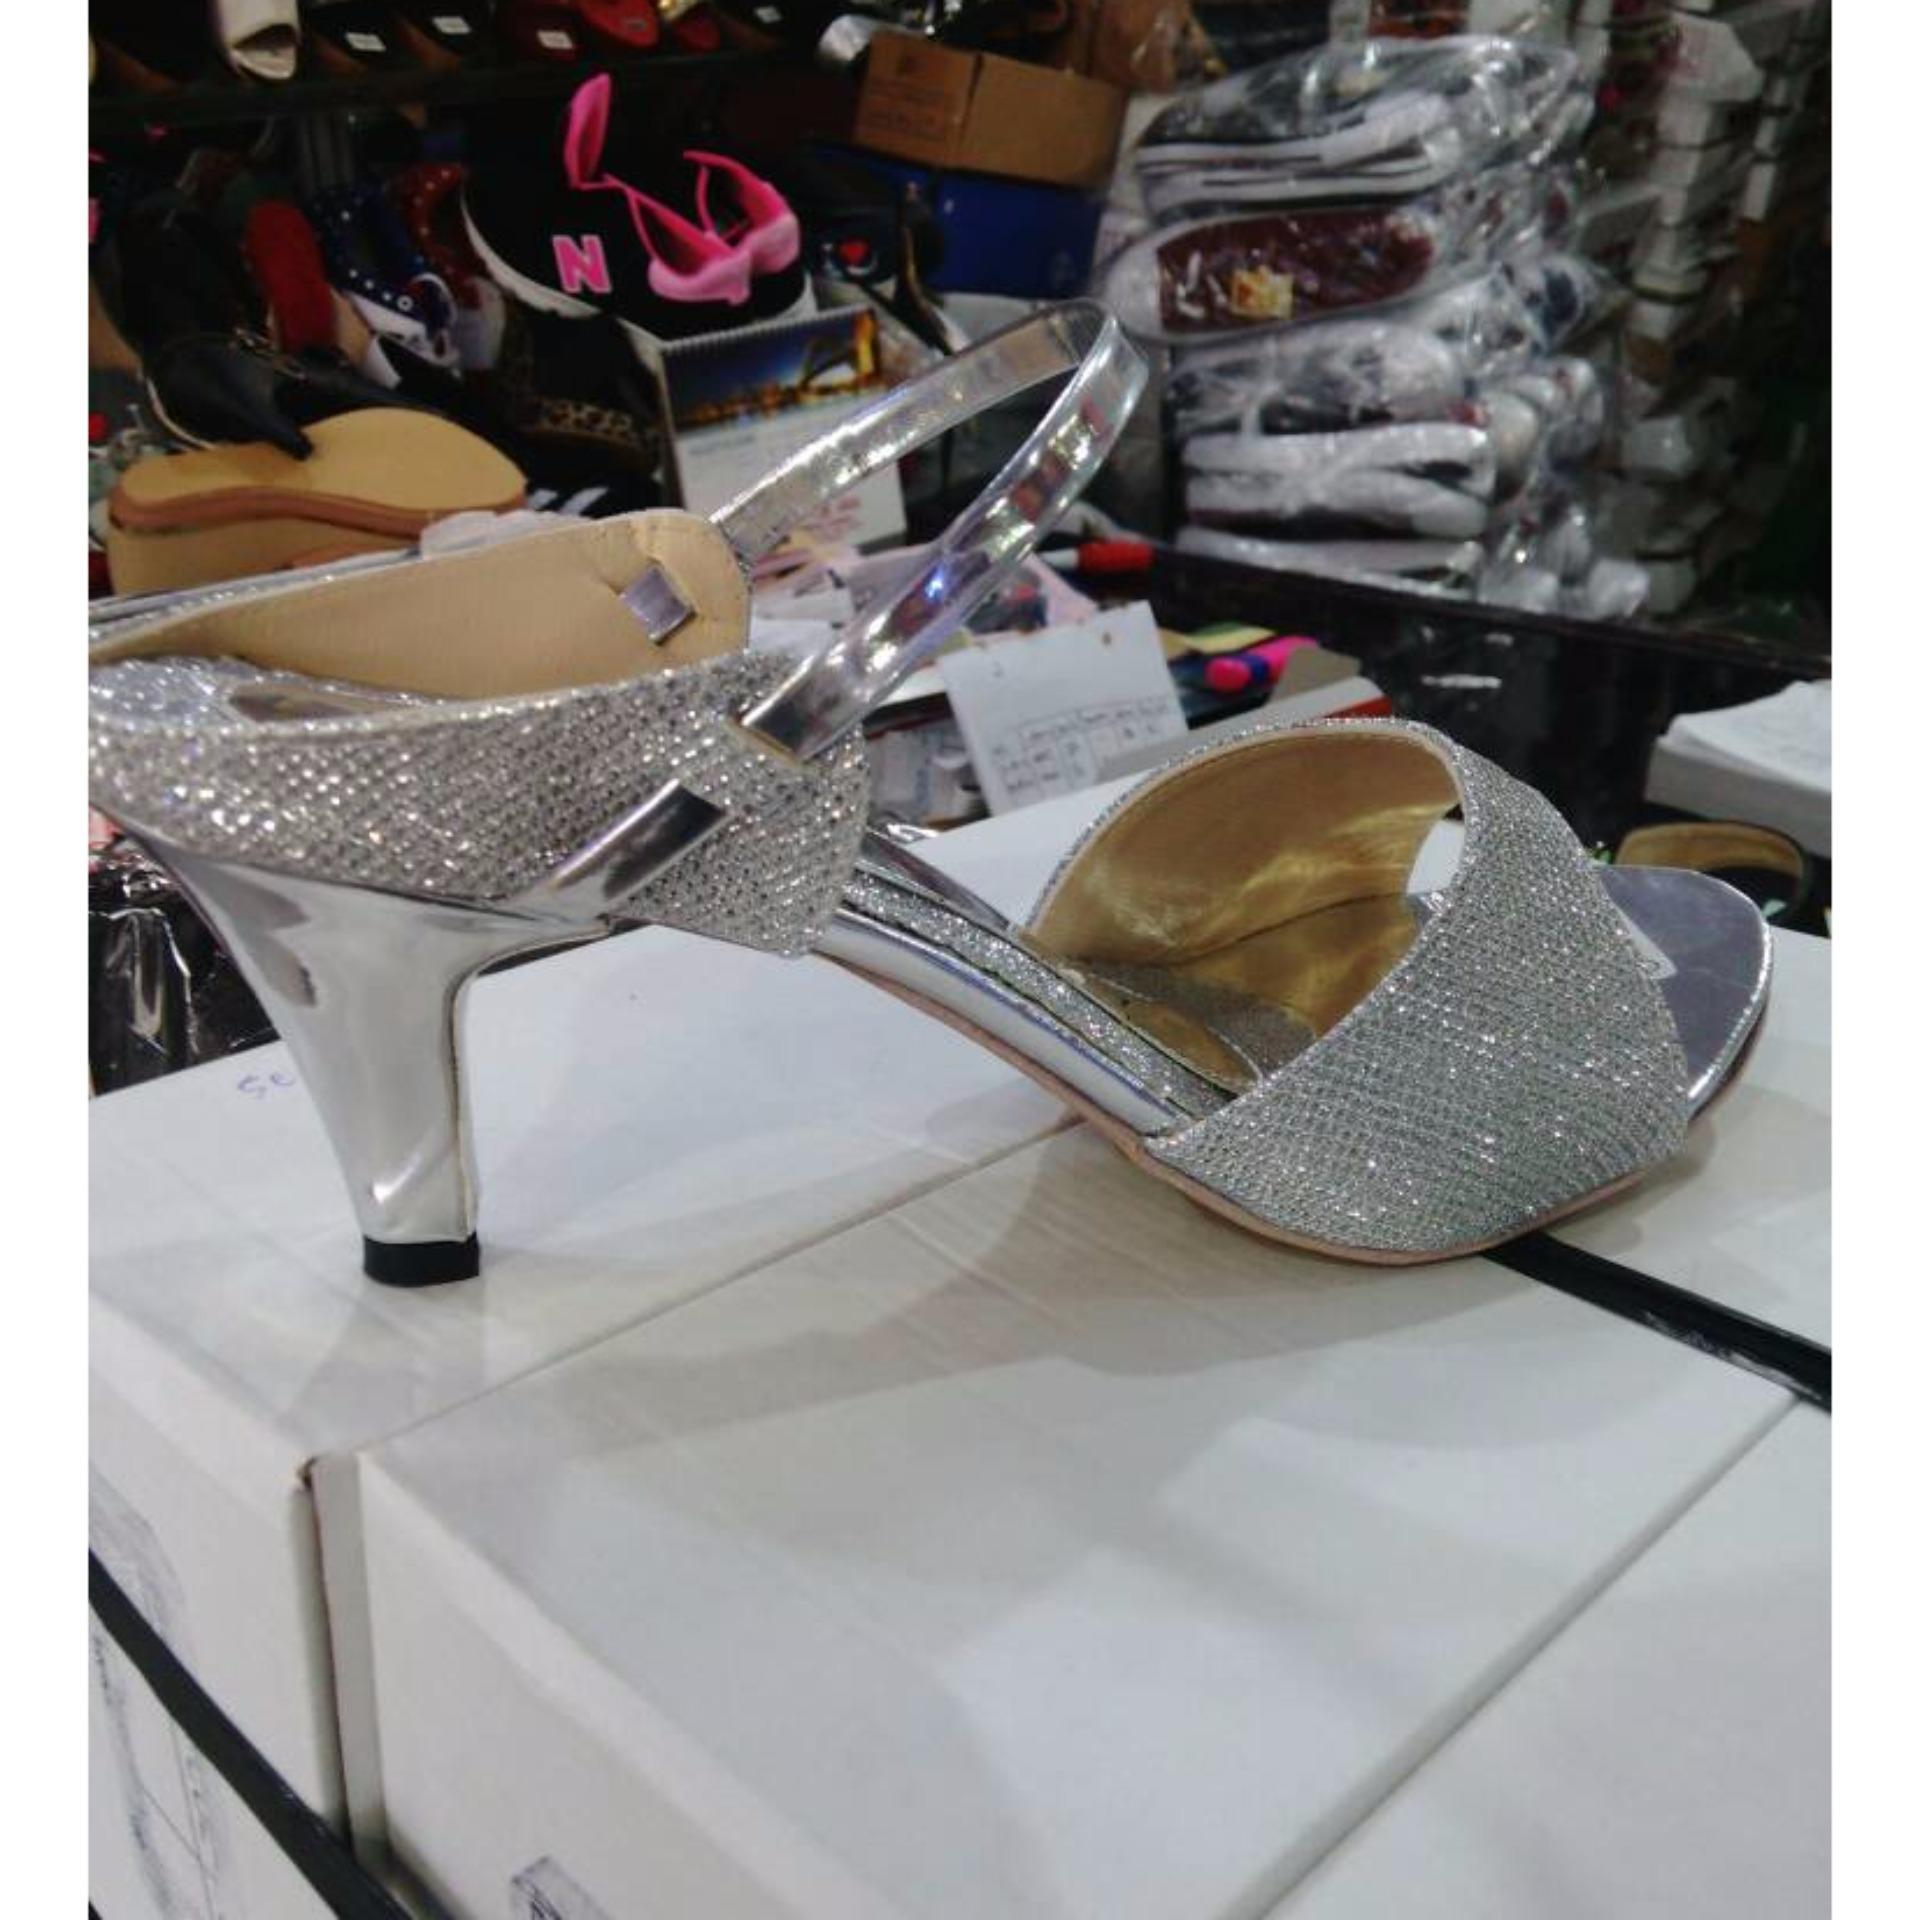 Sepatu Sandal High Heels Lj05 Wanita Glitar Silver - Daftar Harga ... e0390e0262